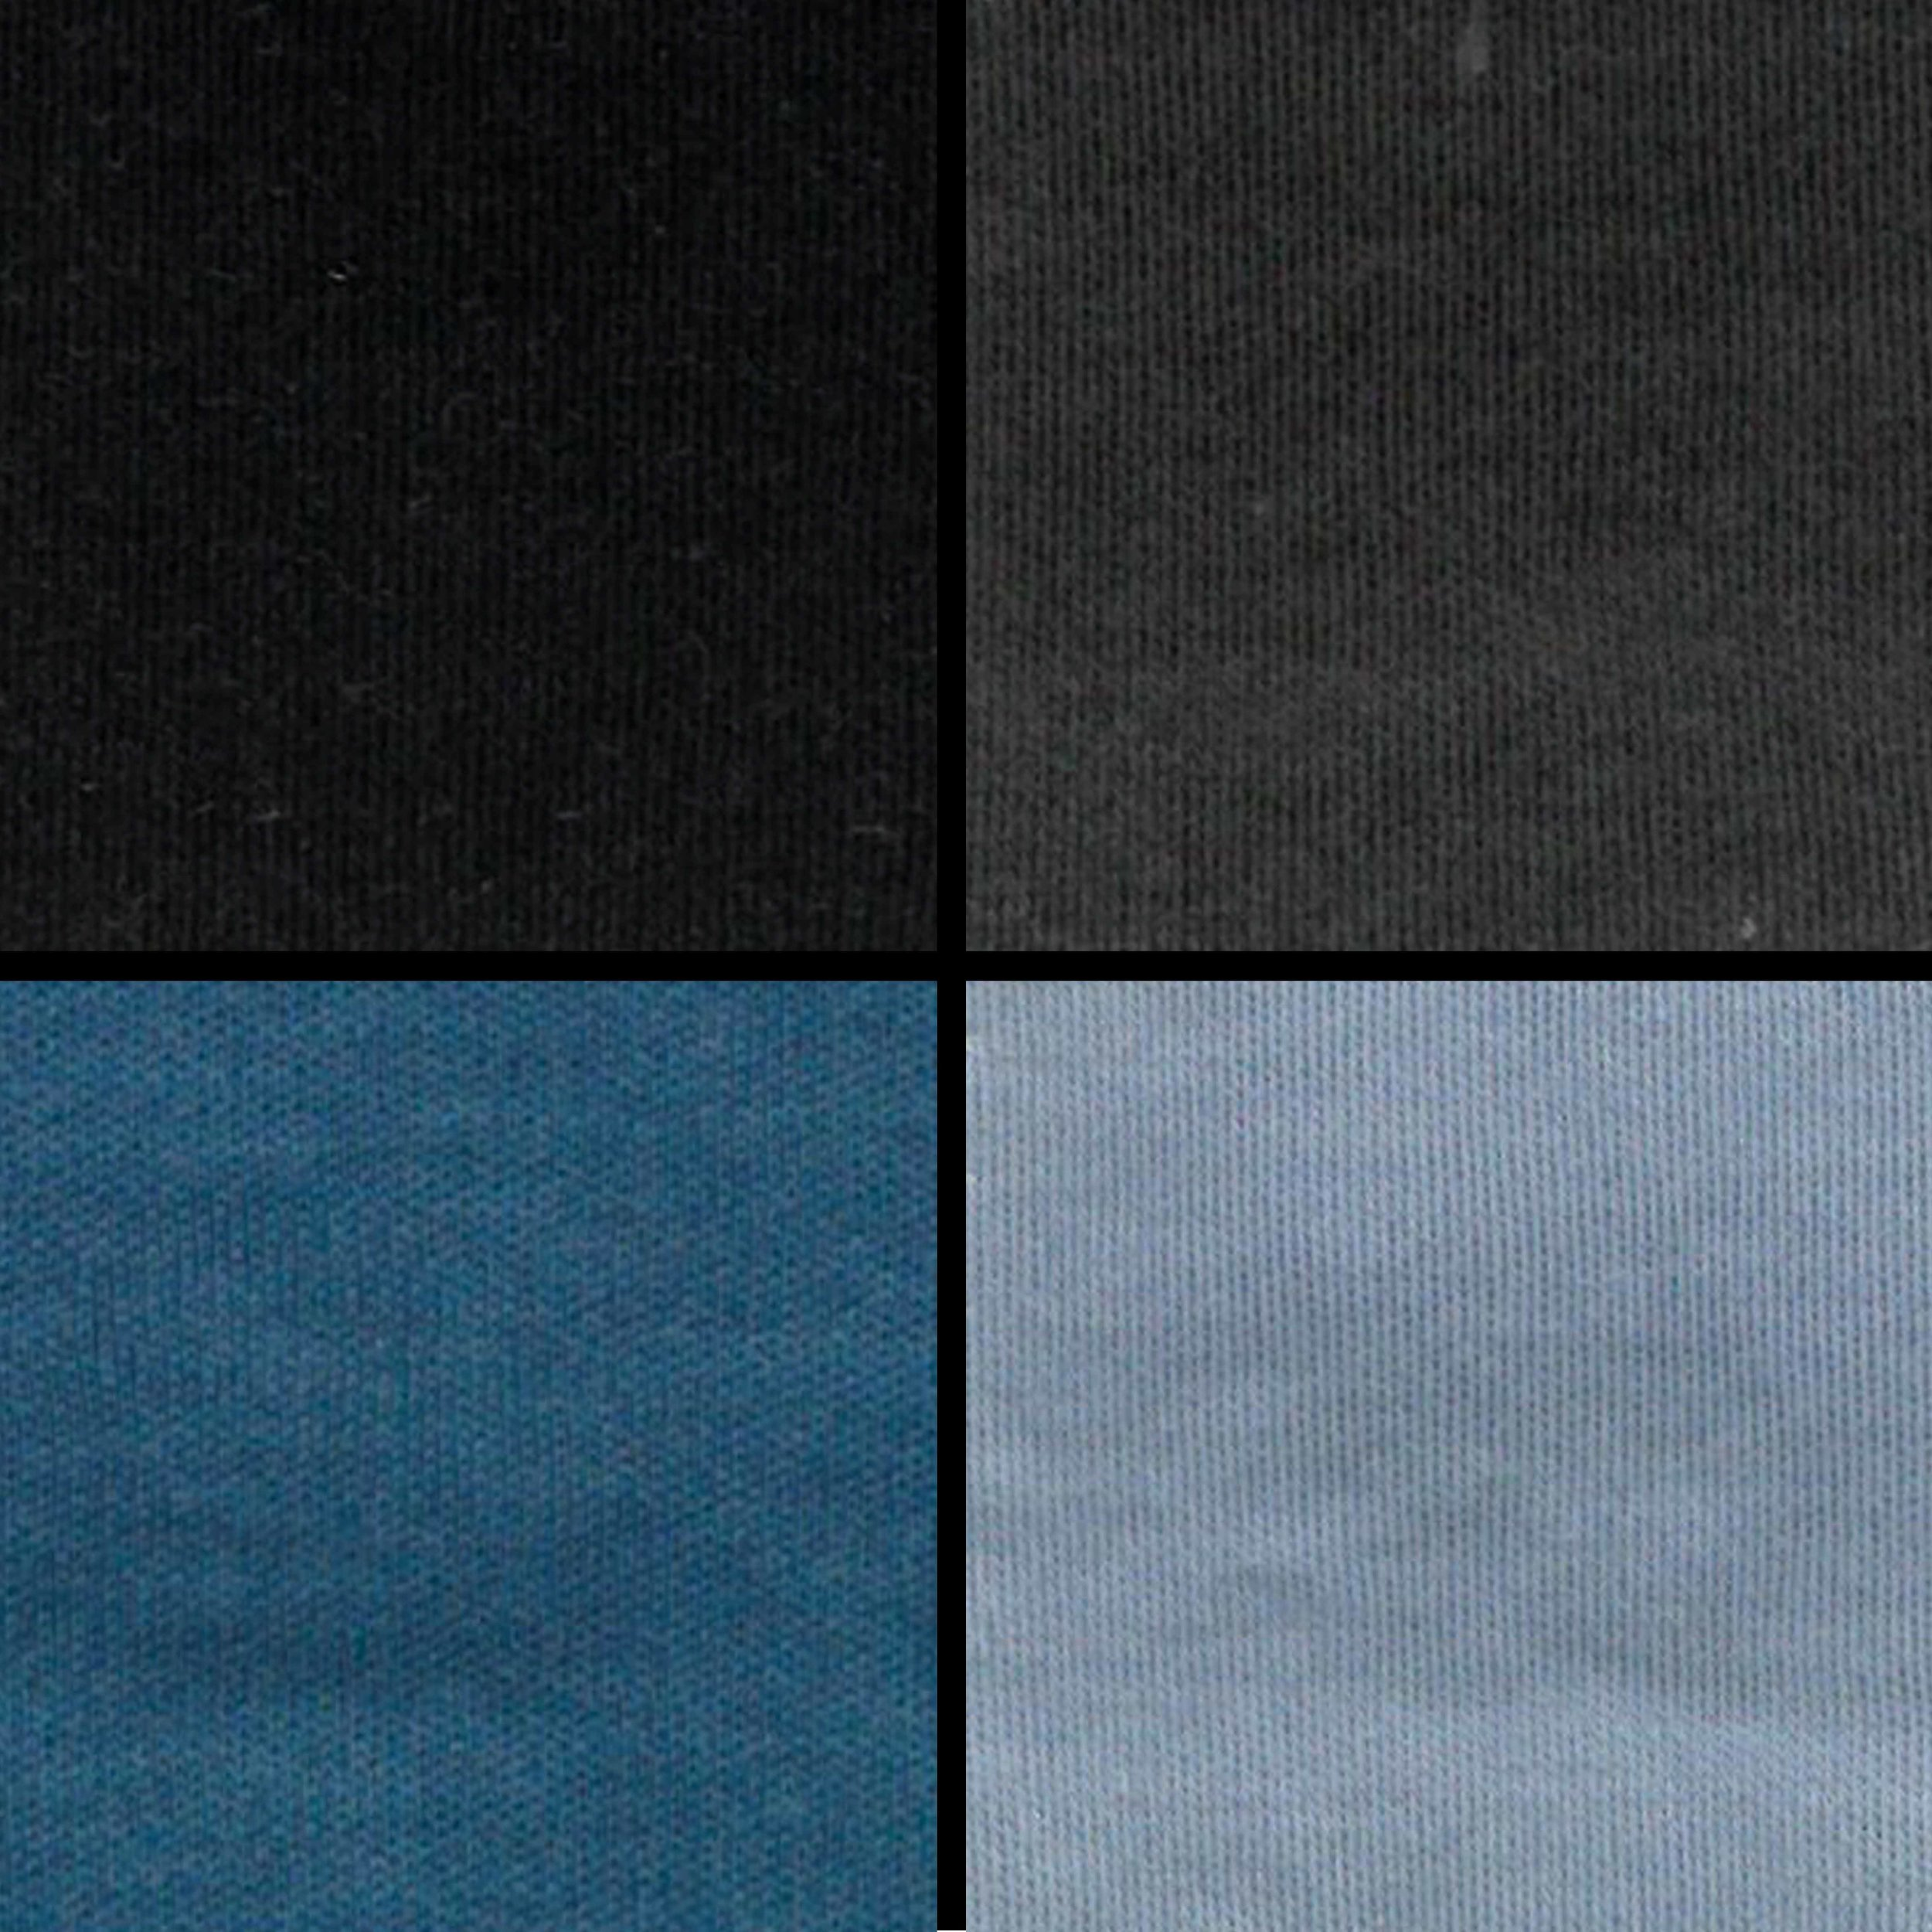 Swatch T - Tencel Organic Cotton Jersey copy.jpg